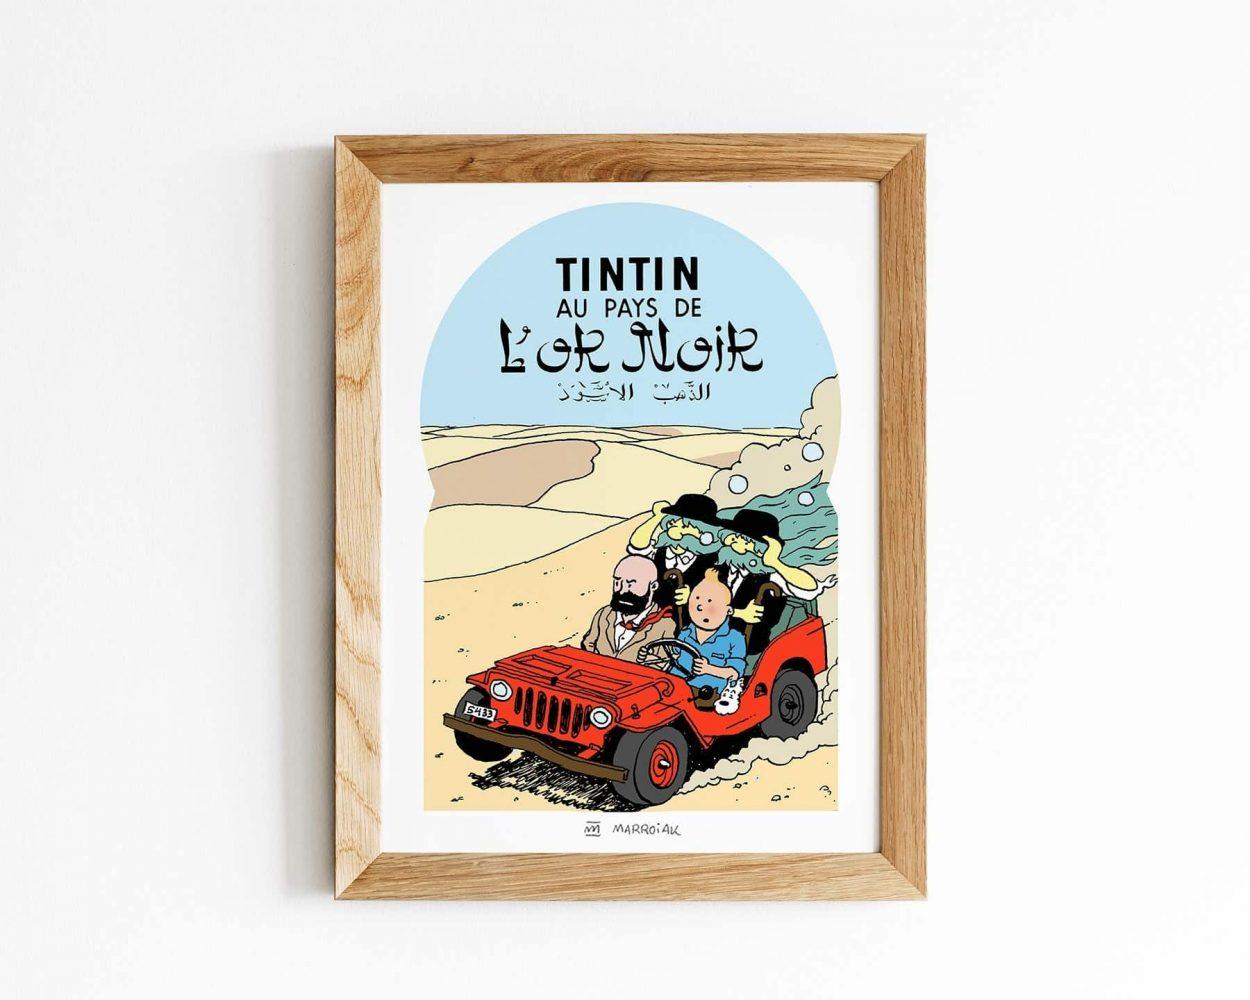 Dibujo de Tintin en el Pais del oro negro